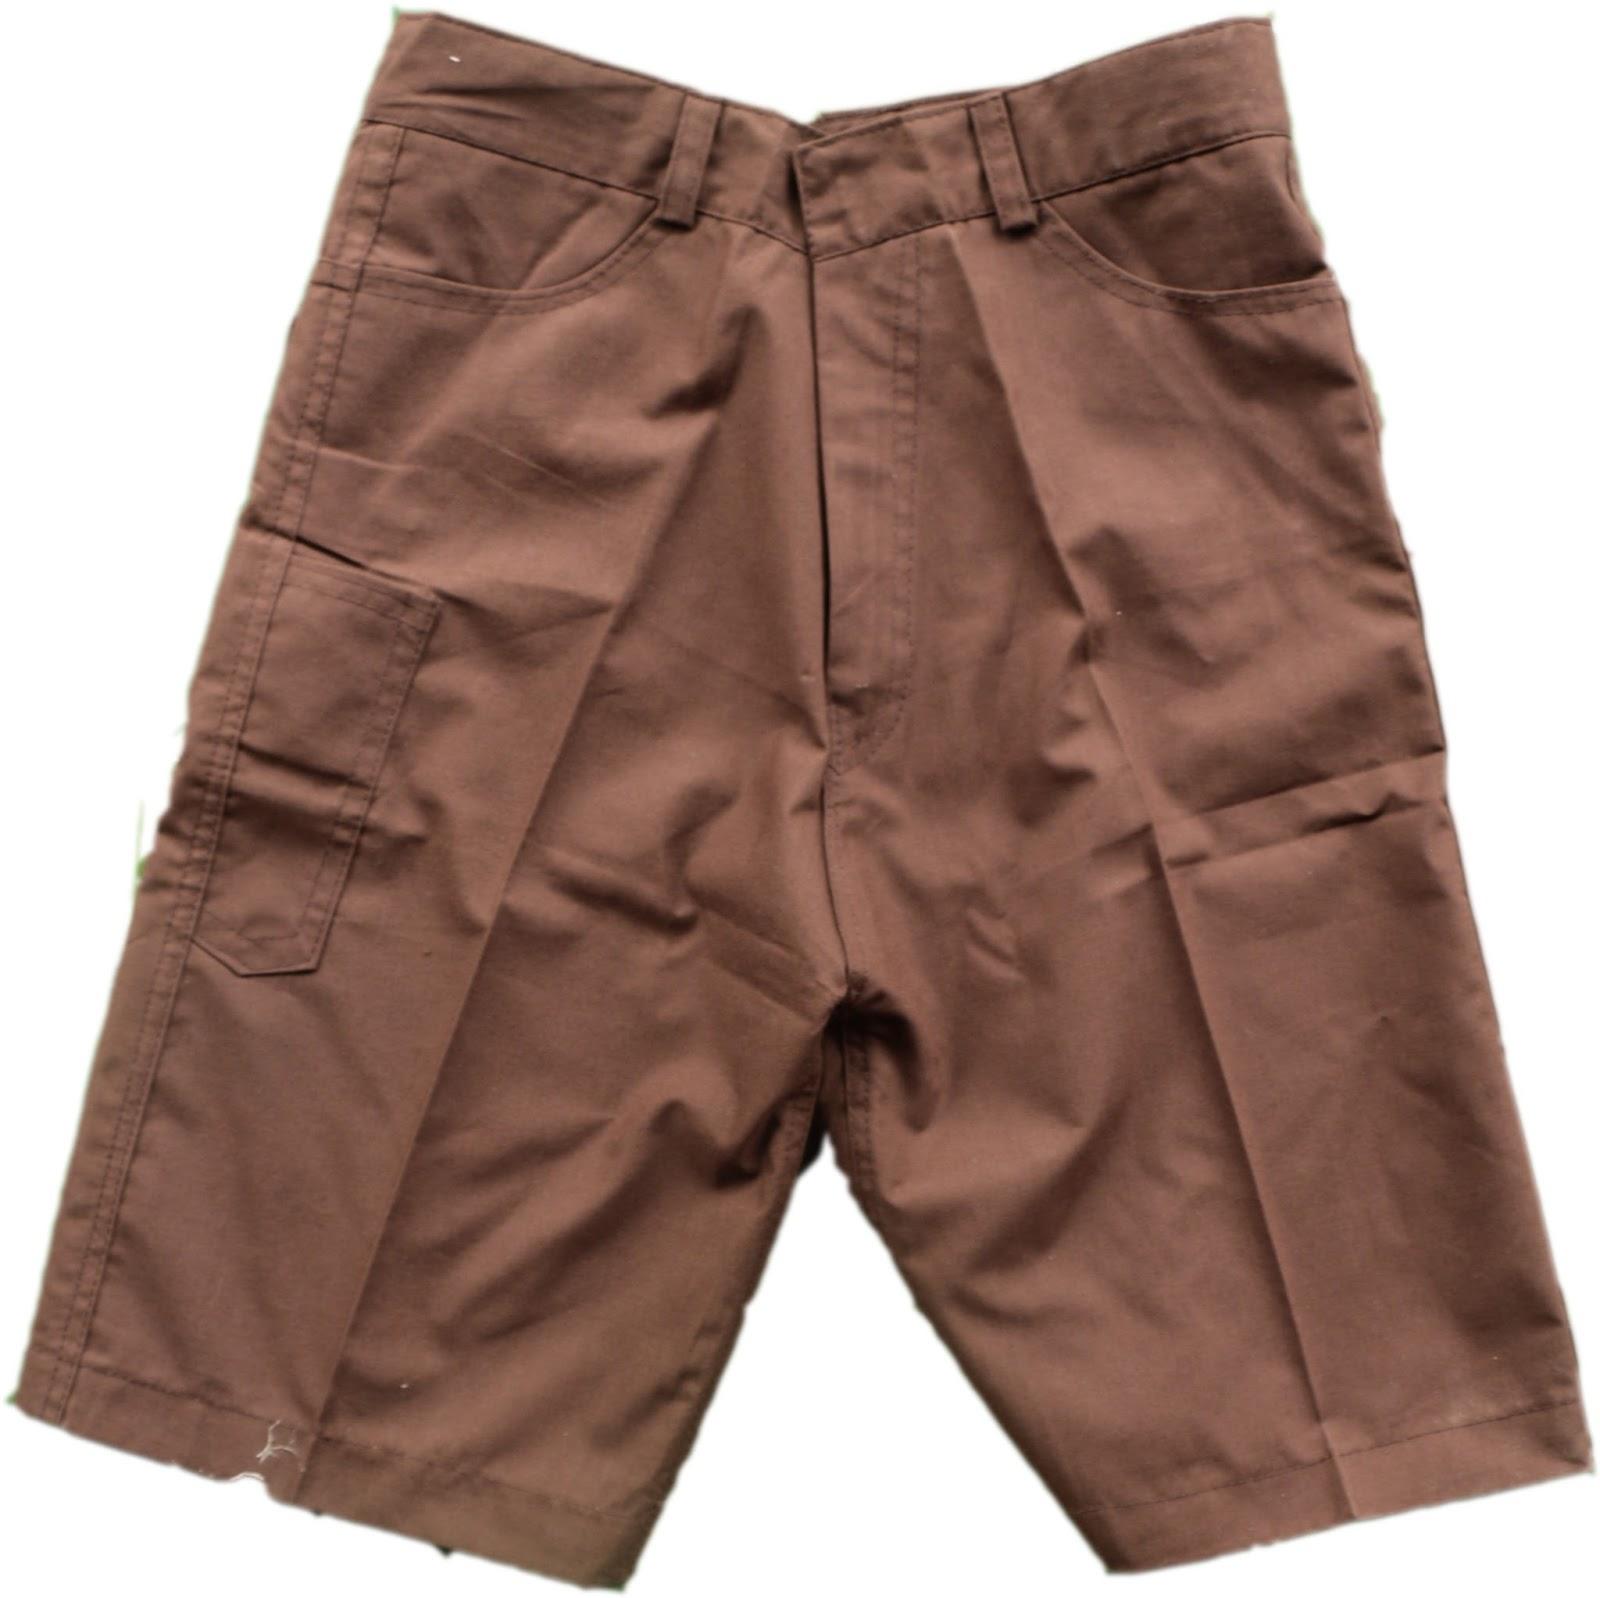 Celana Pramuka Pendek uk L,L2